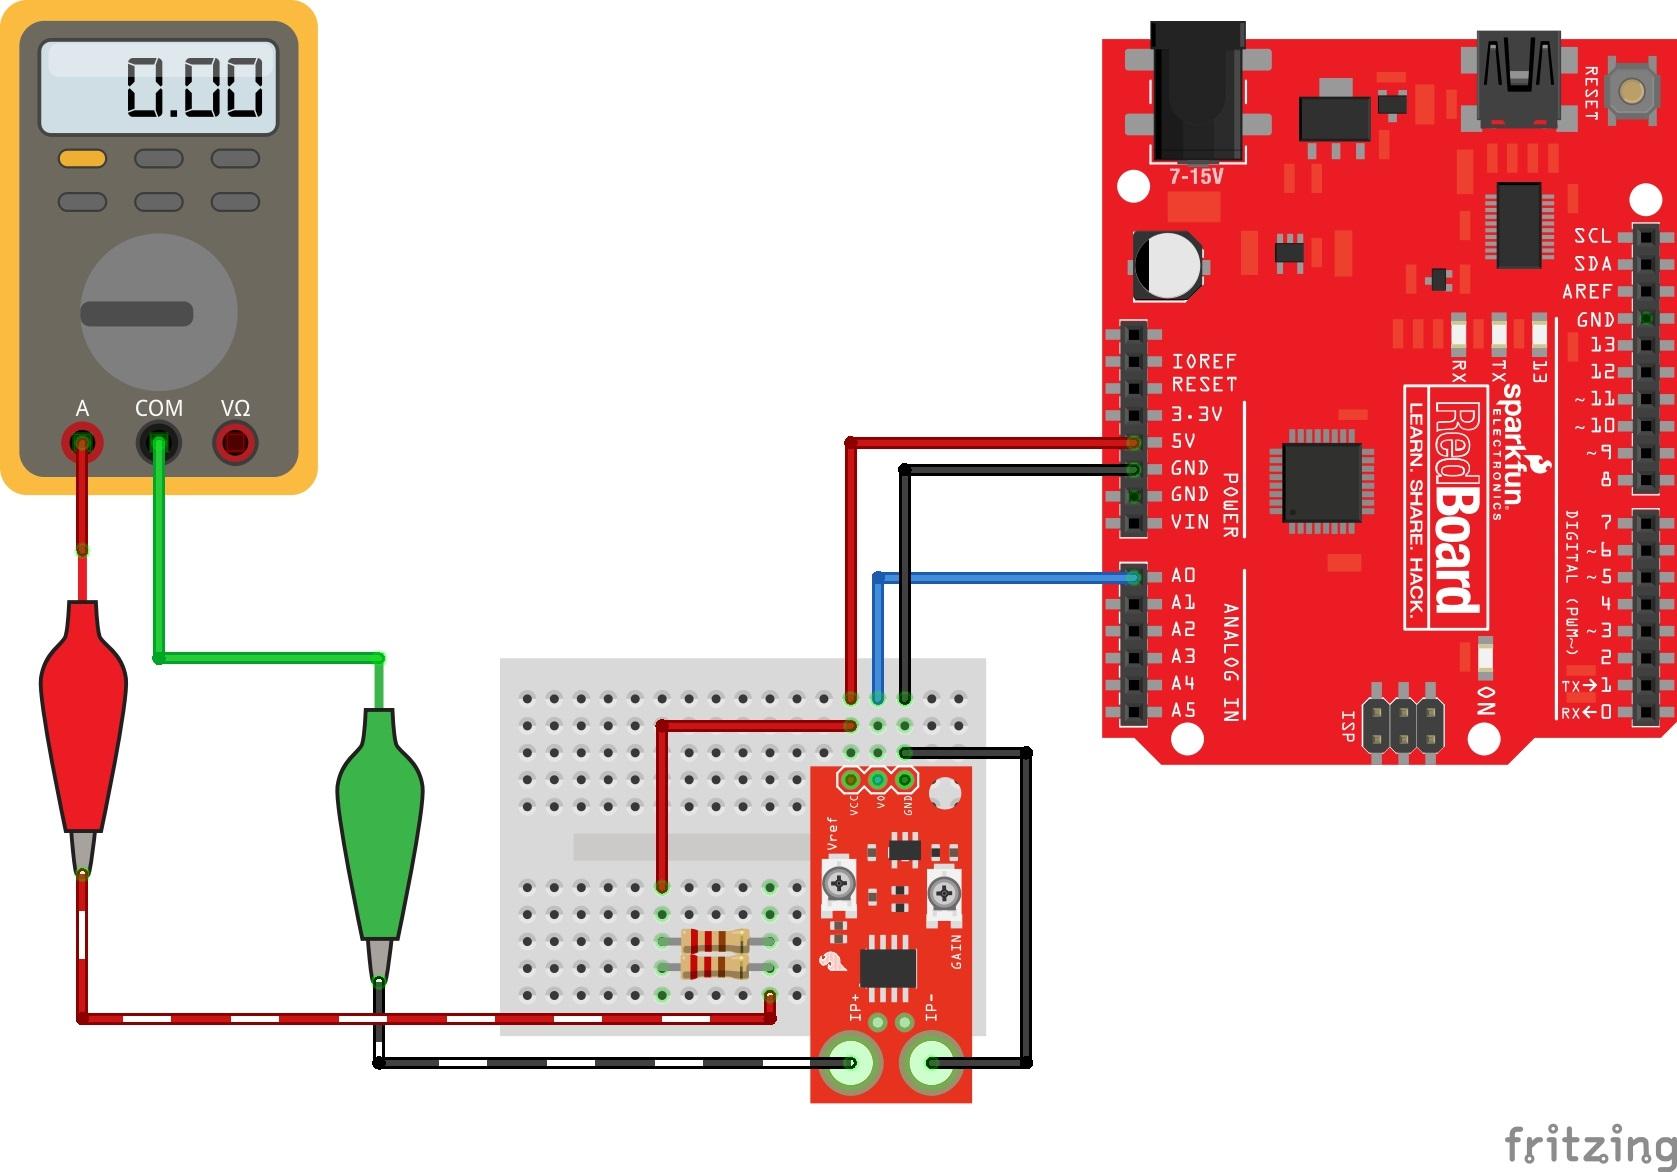 Current Sensor Breakout (ACS723) Hookup Guide - learn